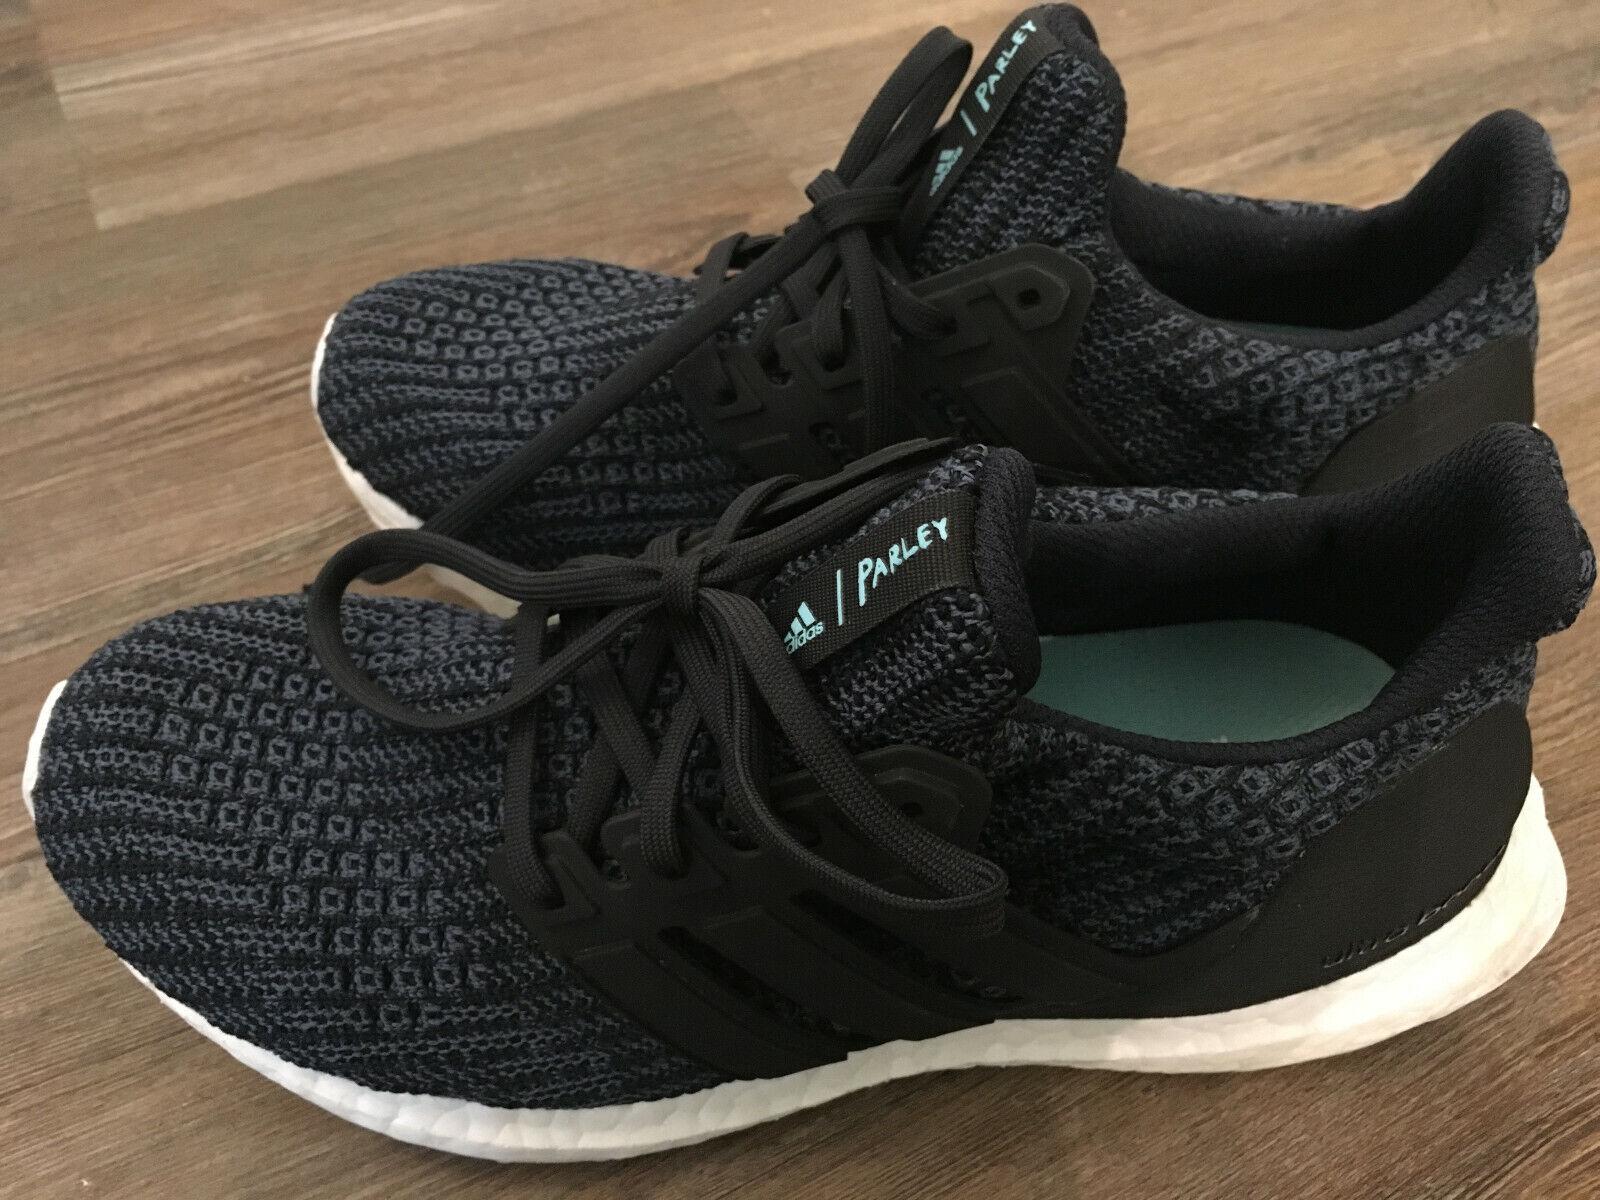 Adidas Parley Ultra Boost women 6.5